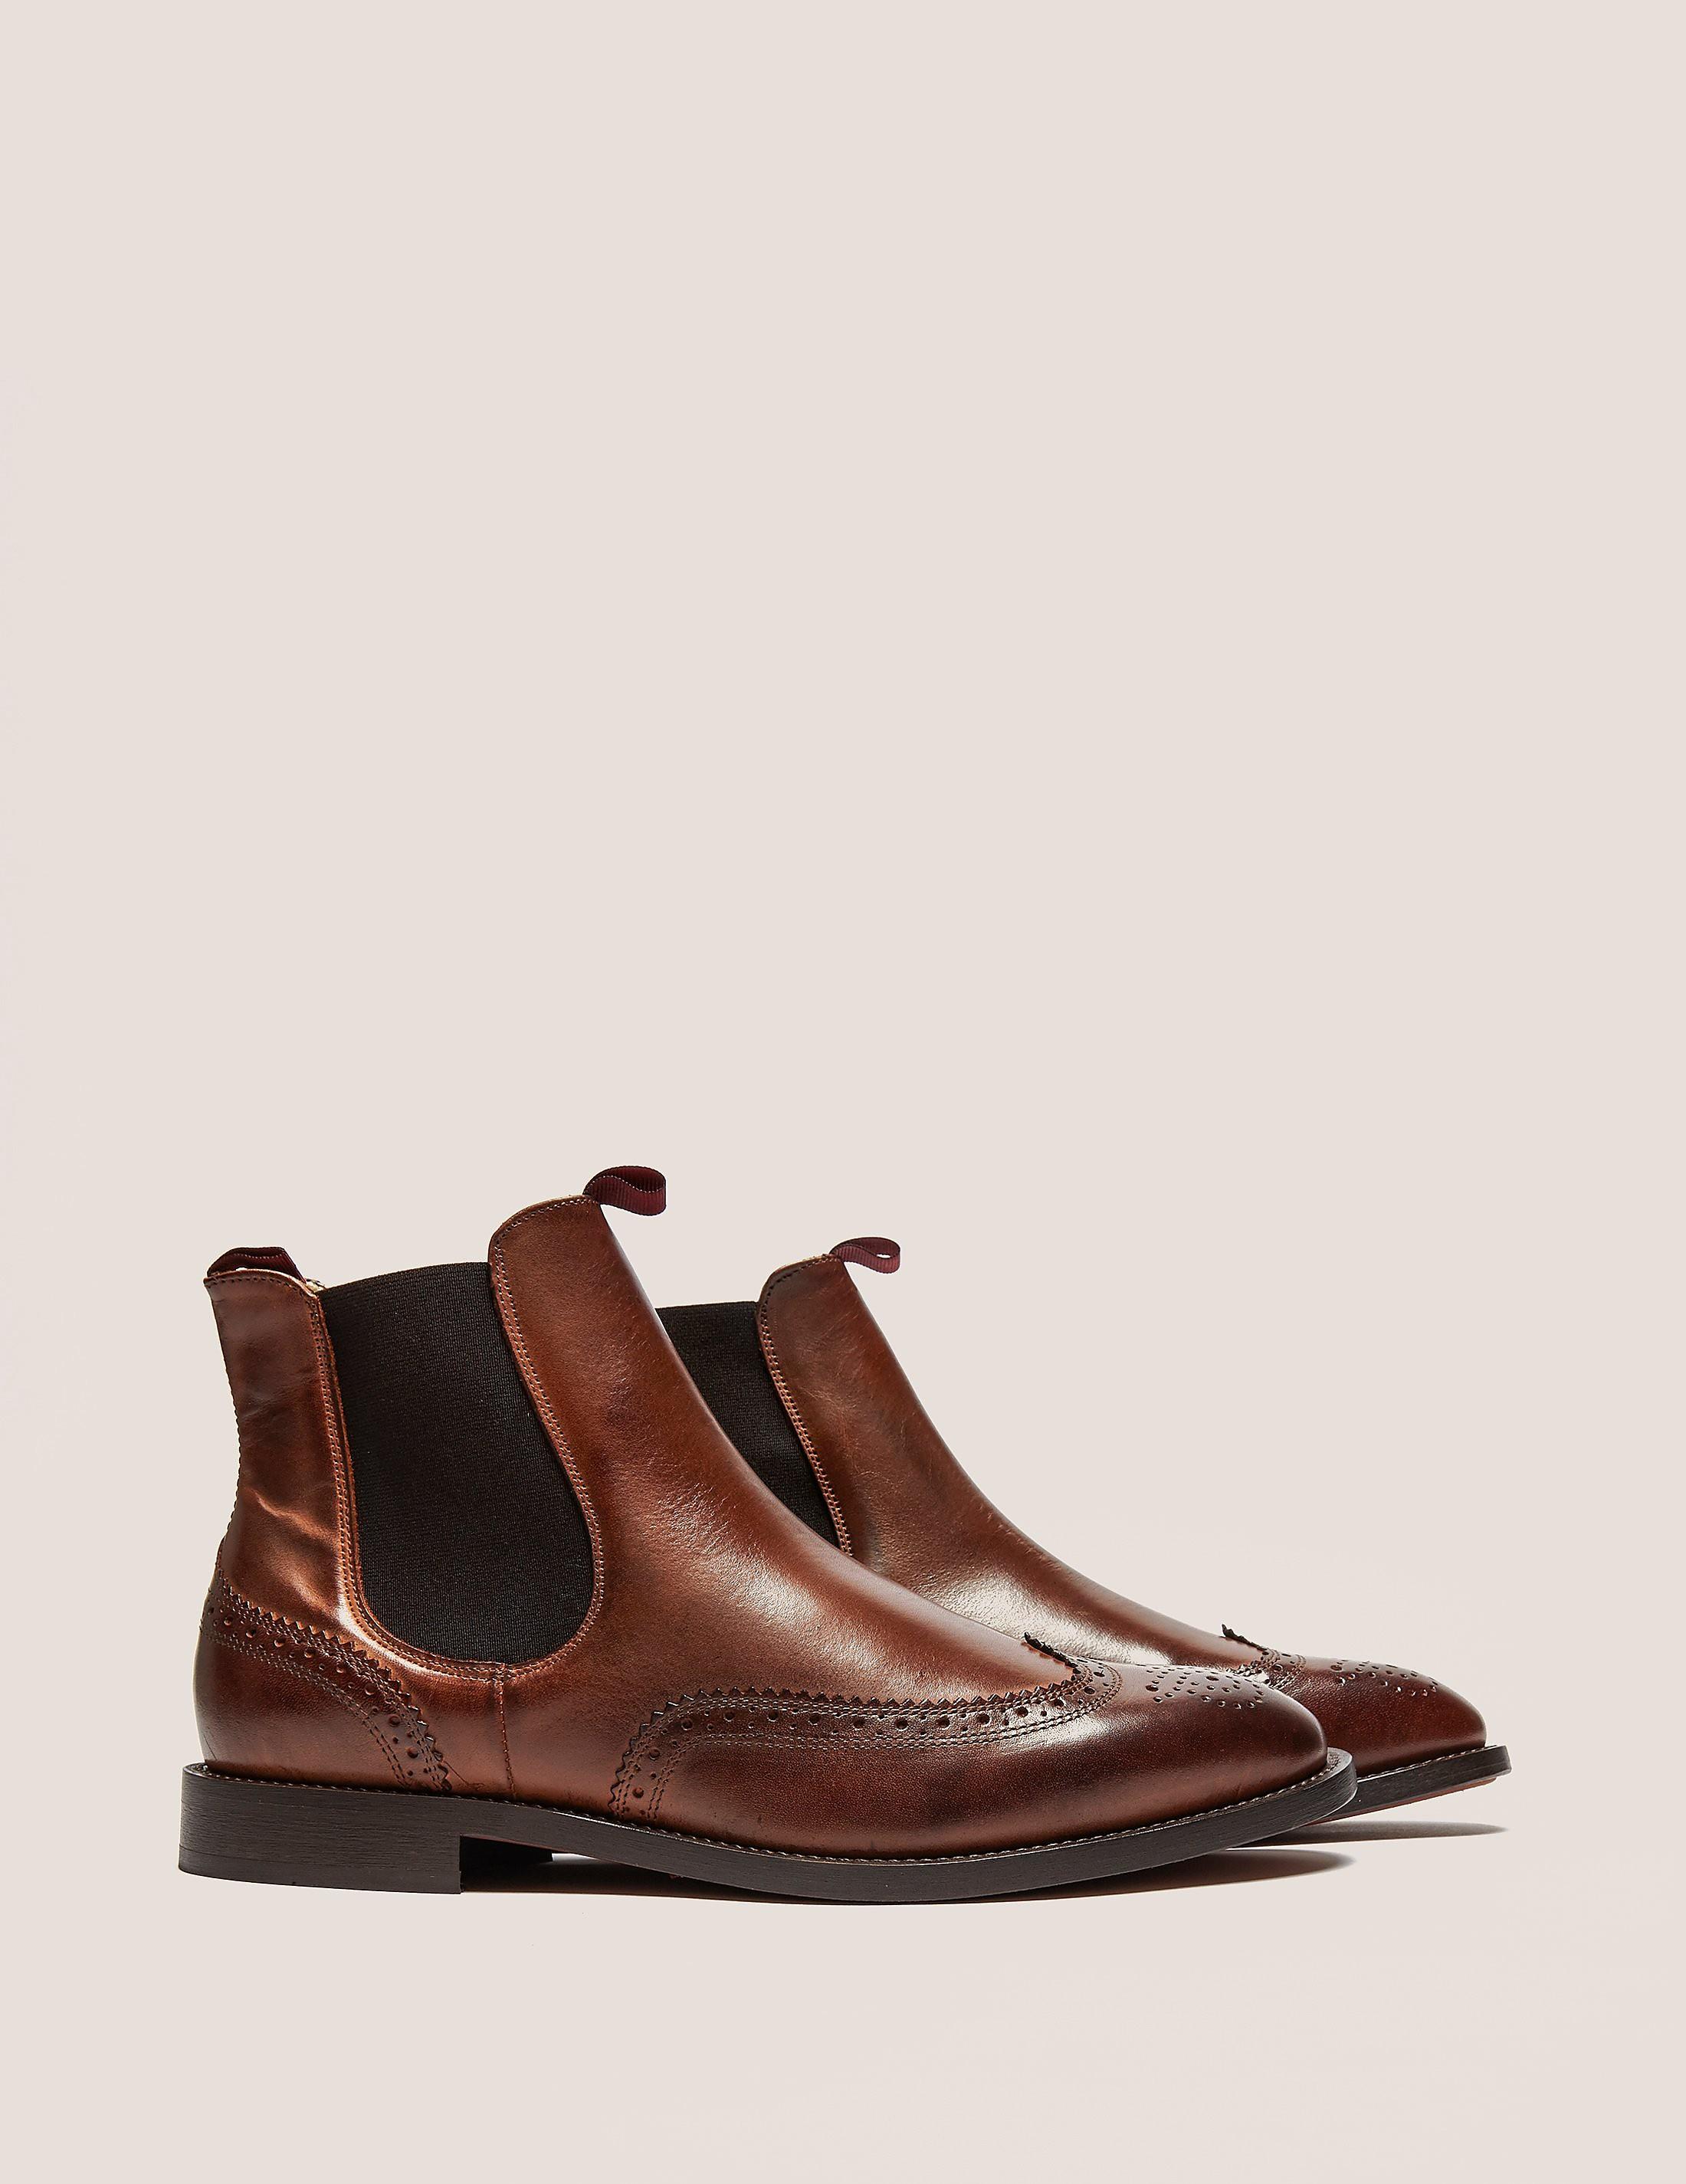 H by Hudson Breslin Boot